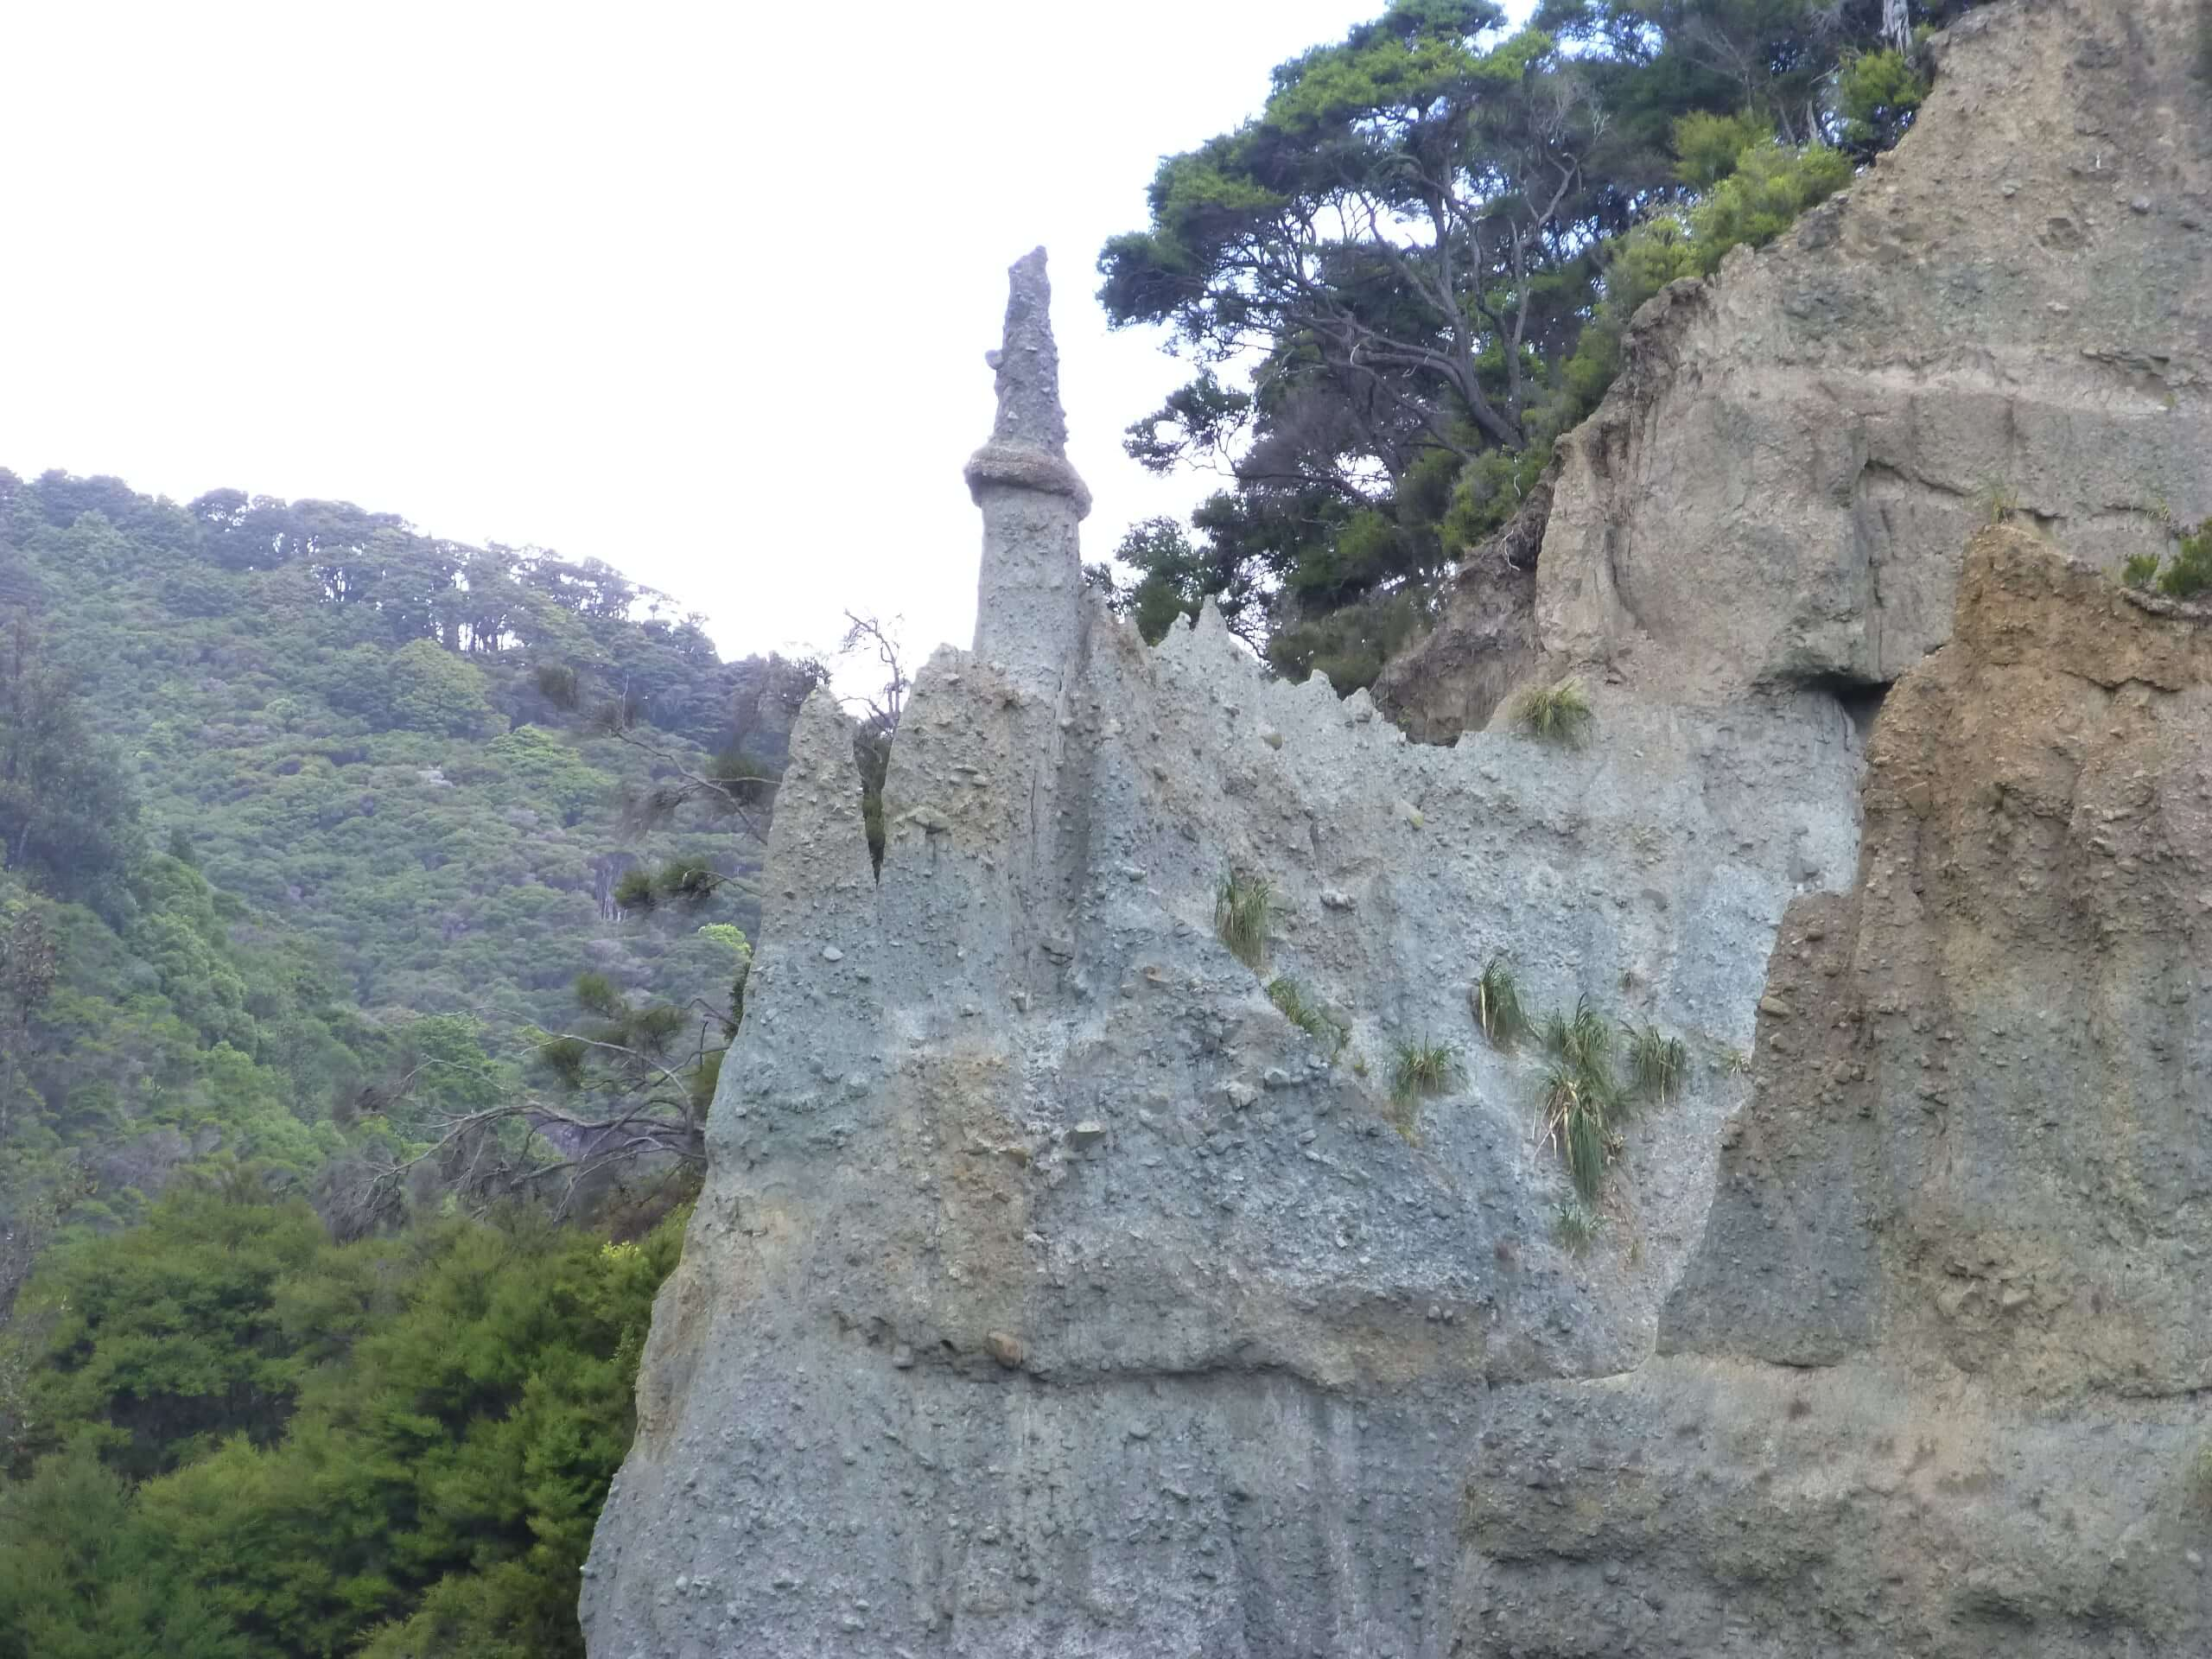 Putangirua Pinnacles 6, Weit-weg.reisen